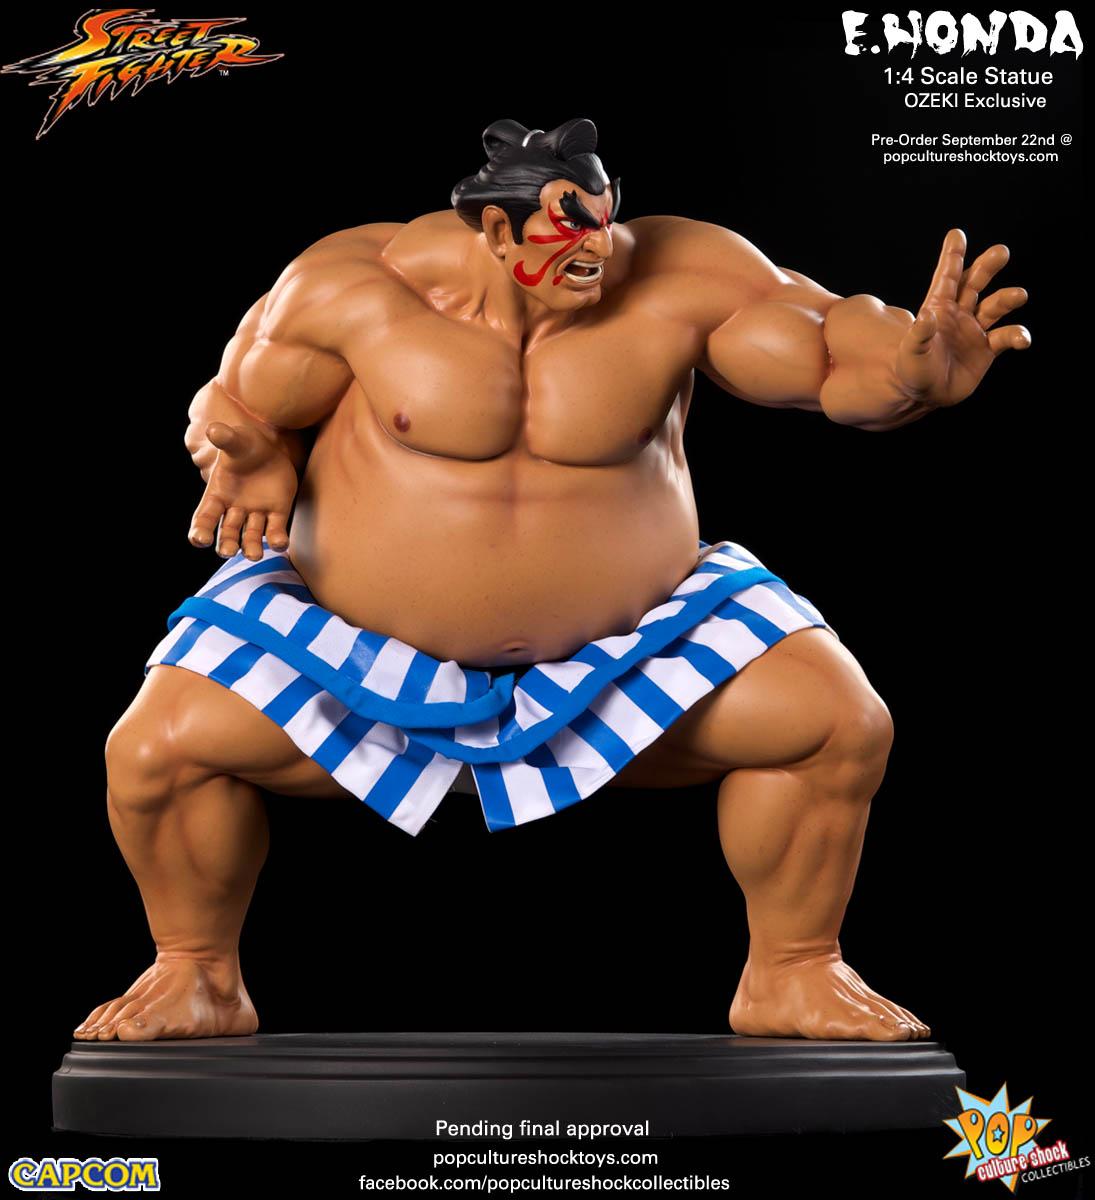 [Pop Culture Shock] Street Fighter: E. Honda 1/4 Statue - Página 3 Street-Fighter-E.-Honda-ozeki-Statue-006